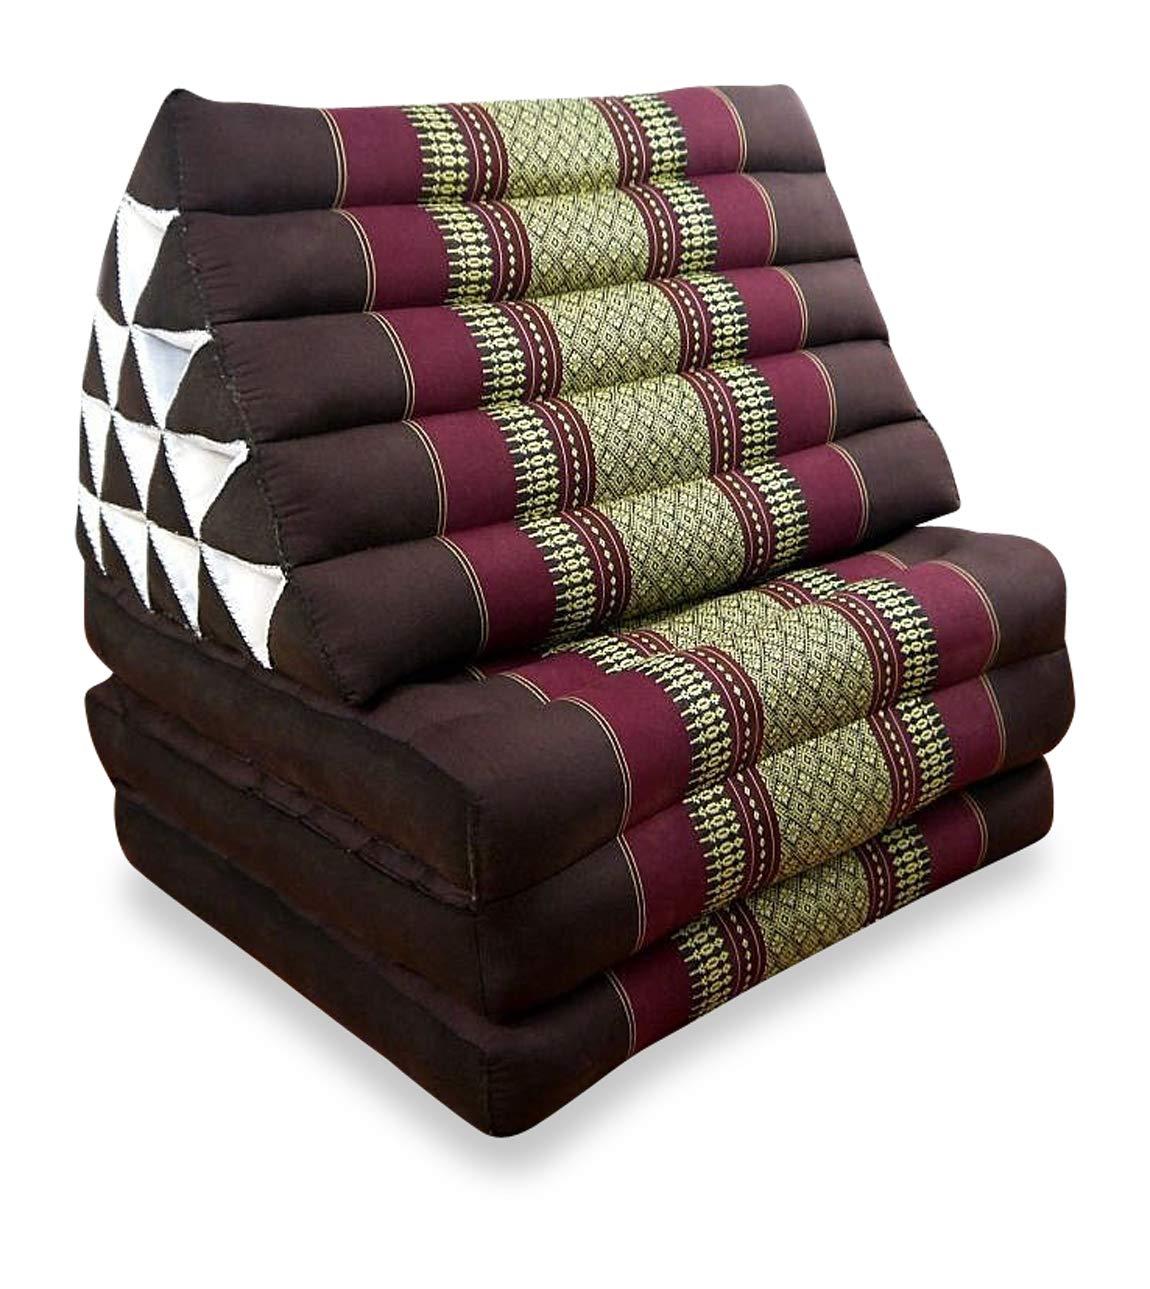 Amazon.com: Asia wohnstudio 3 Fold con extragrande triángulo ...